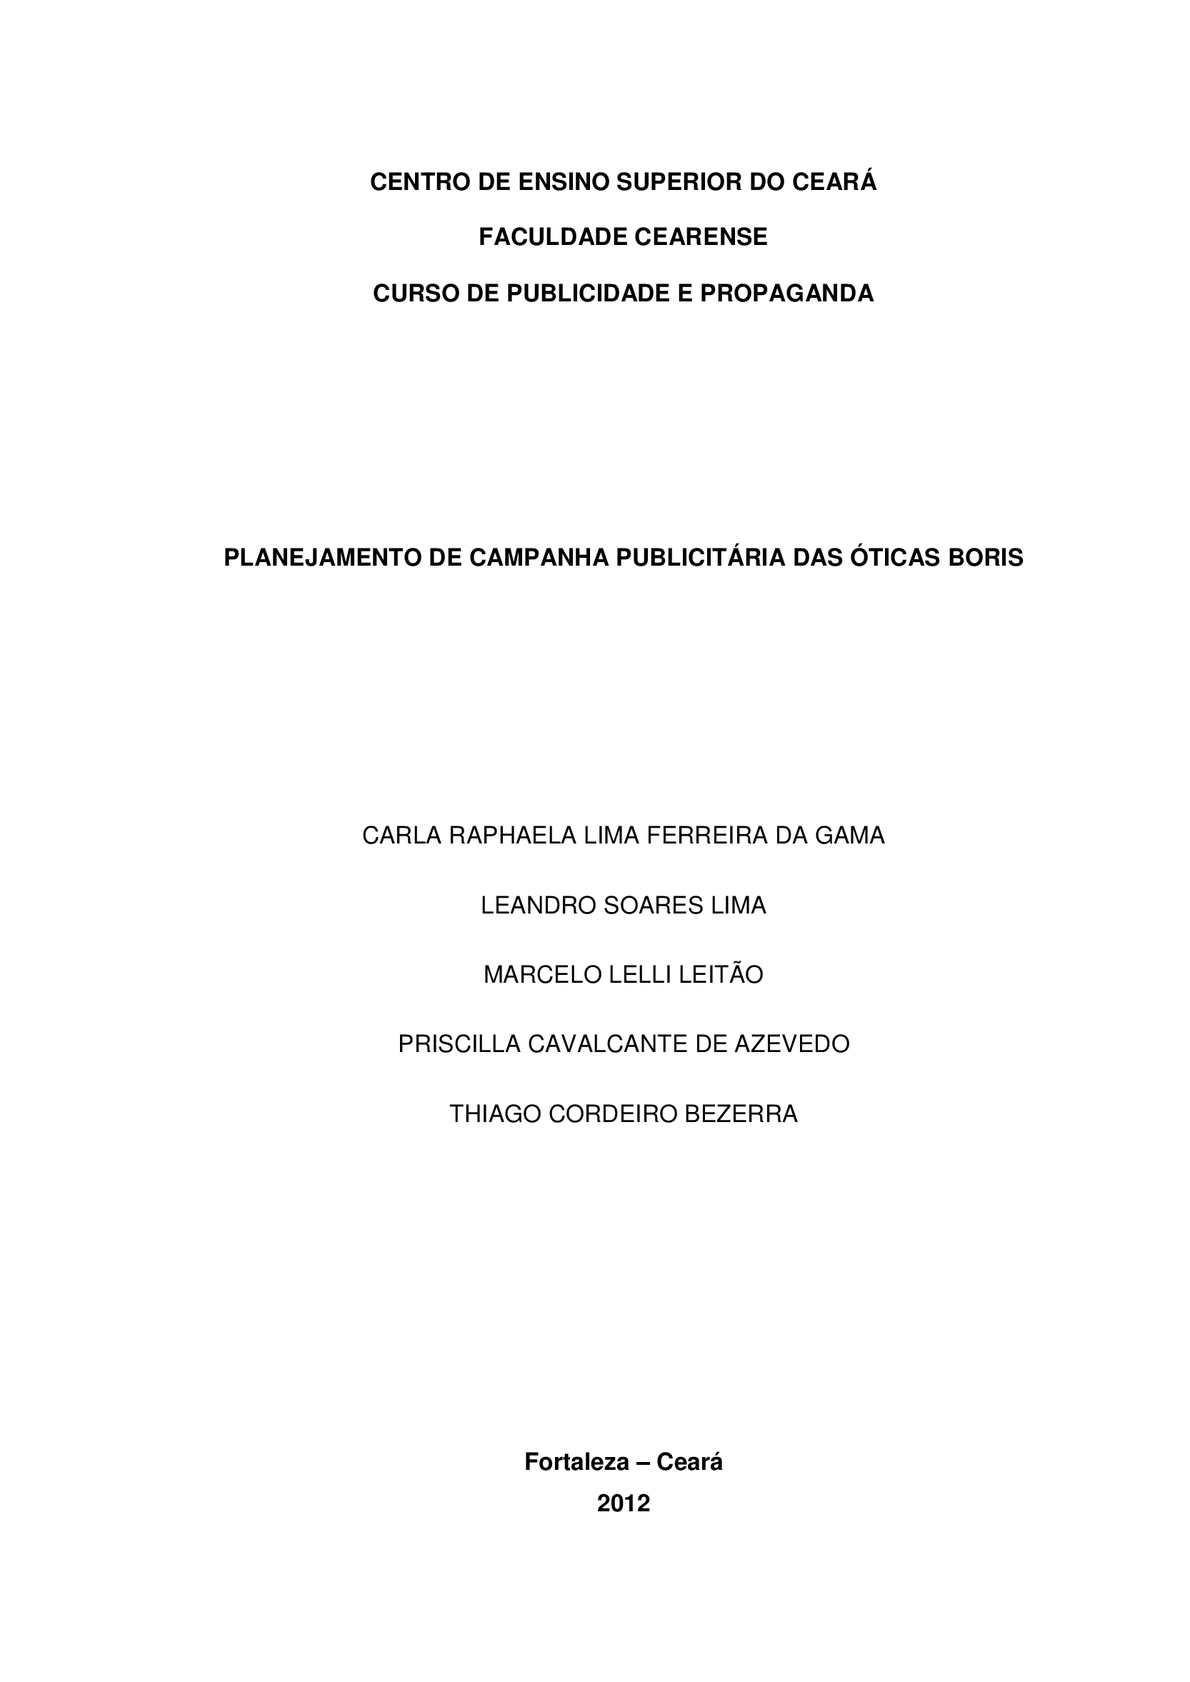 Calaméo - TCC Oticas Boris 24276603b8